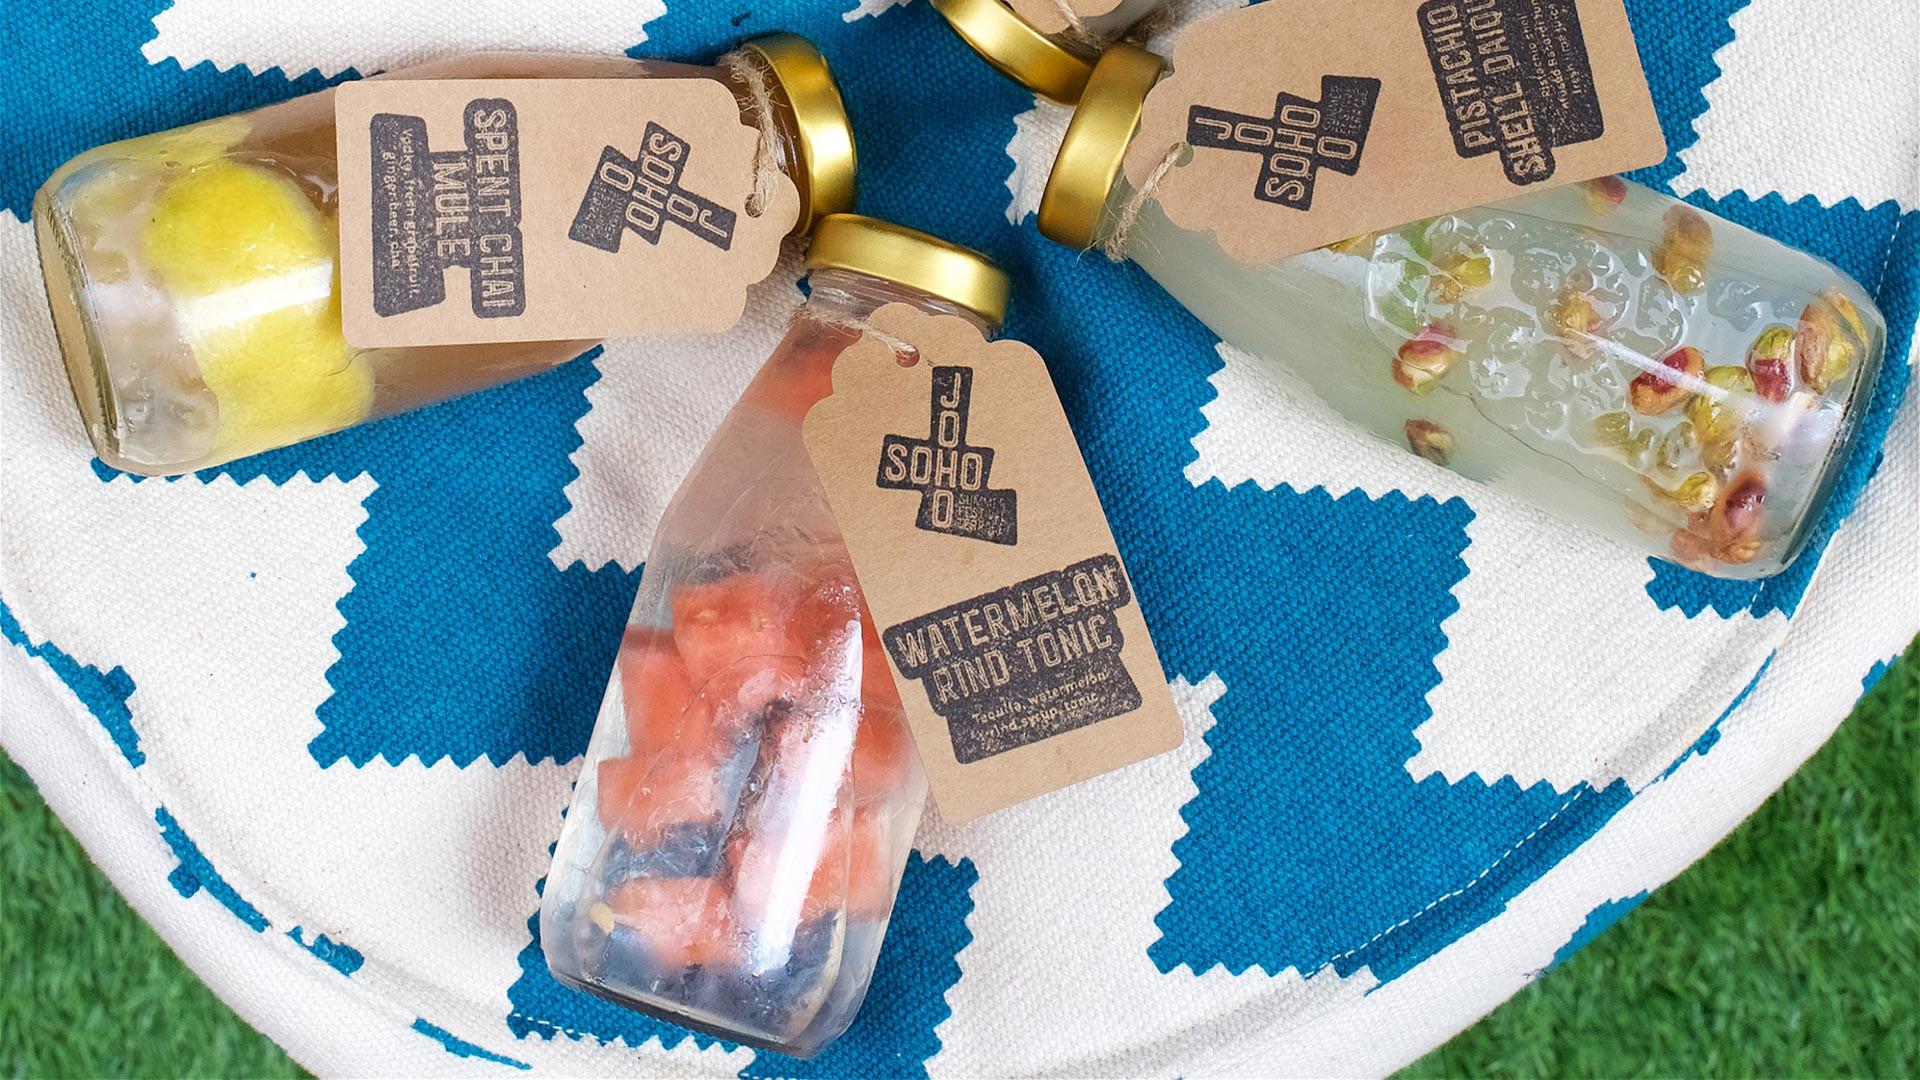 Cinnamon Soho's sustainable summer cocktails